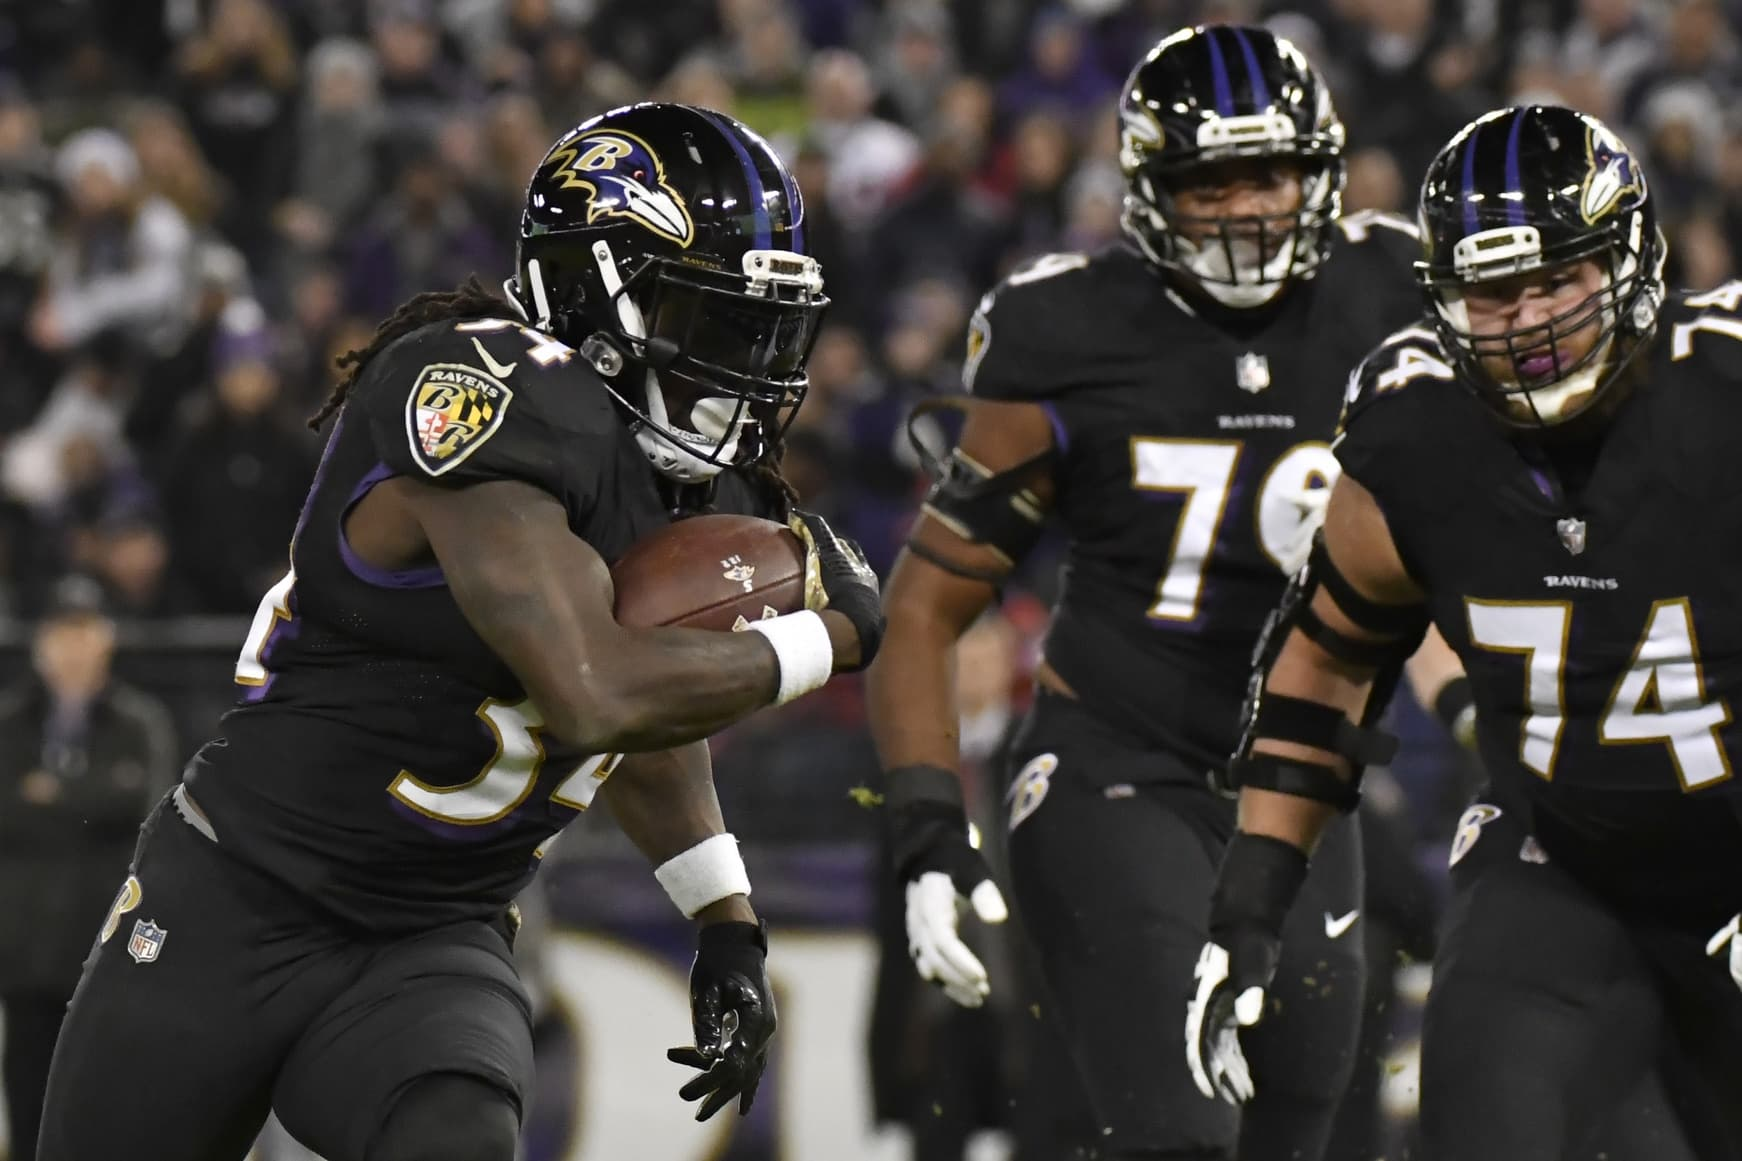 Ravens running back Jarvorius Allen on Monday Night Football